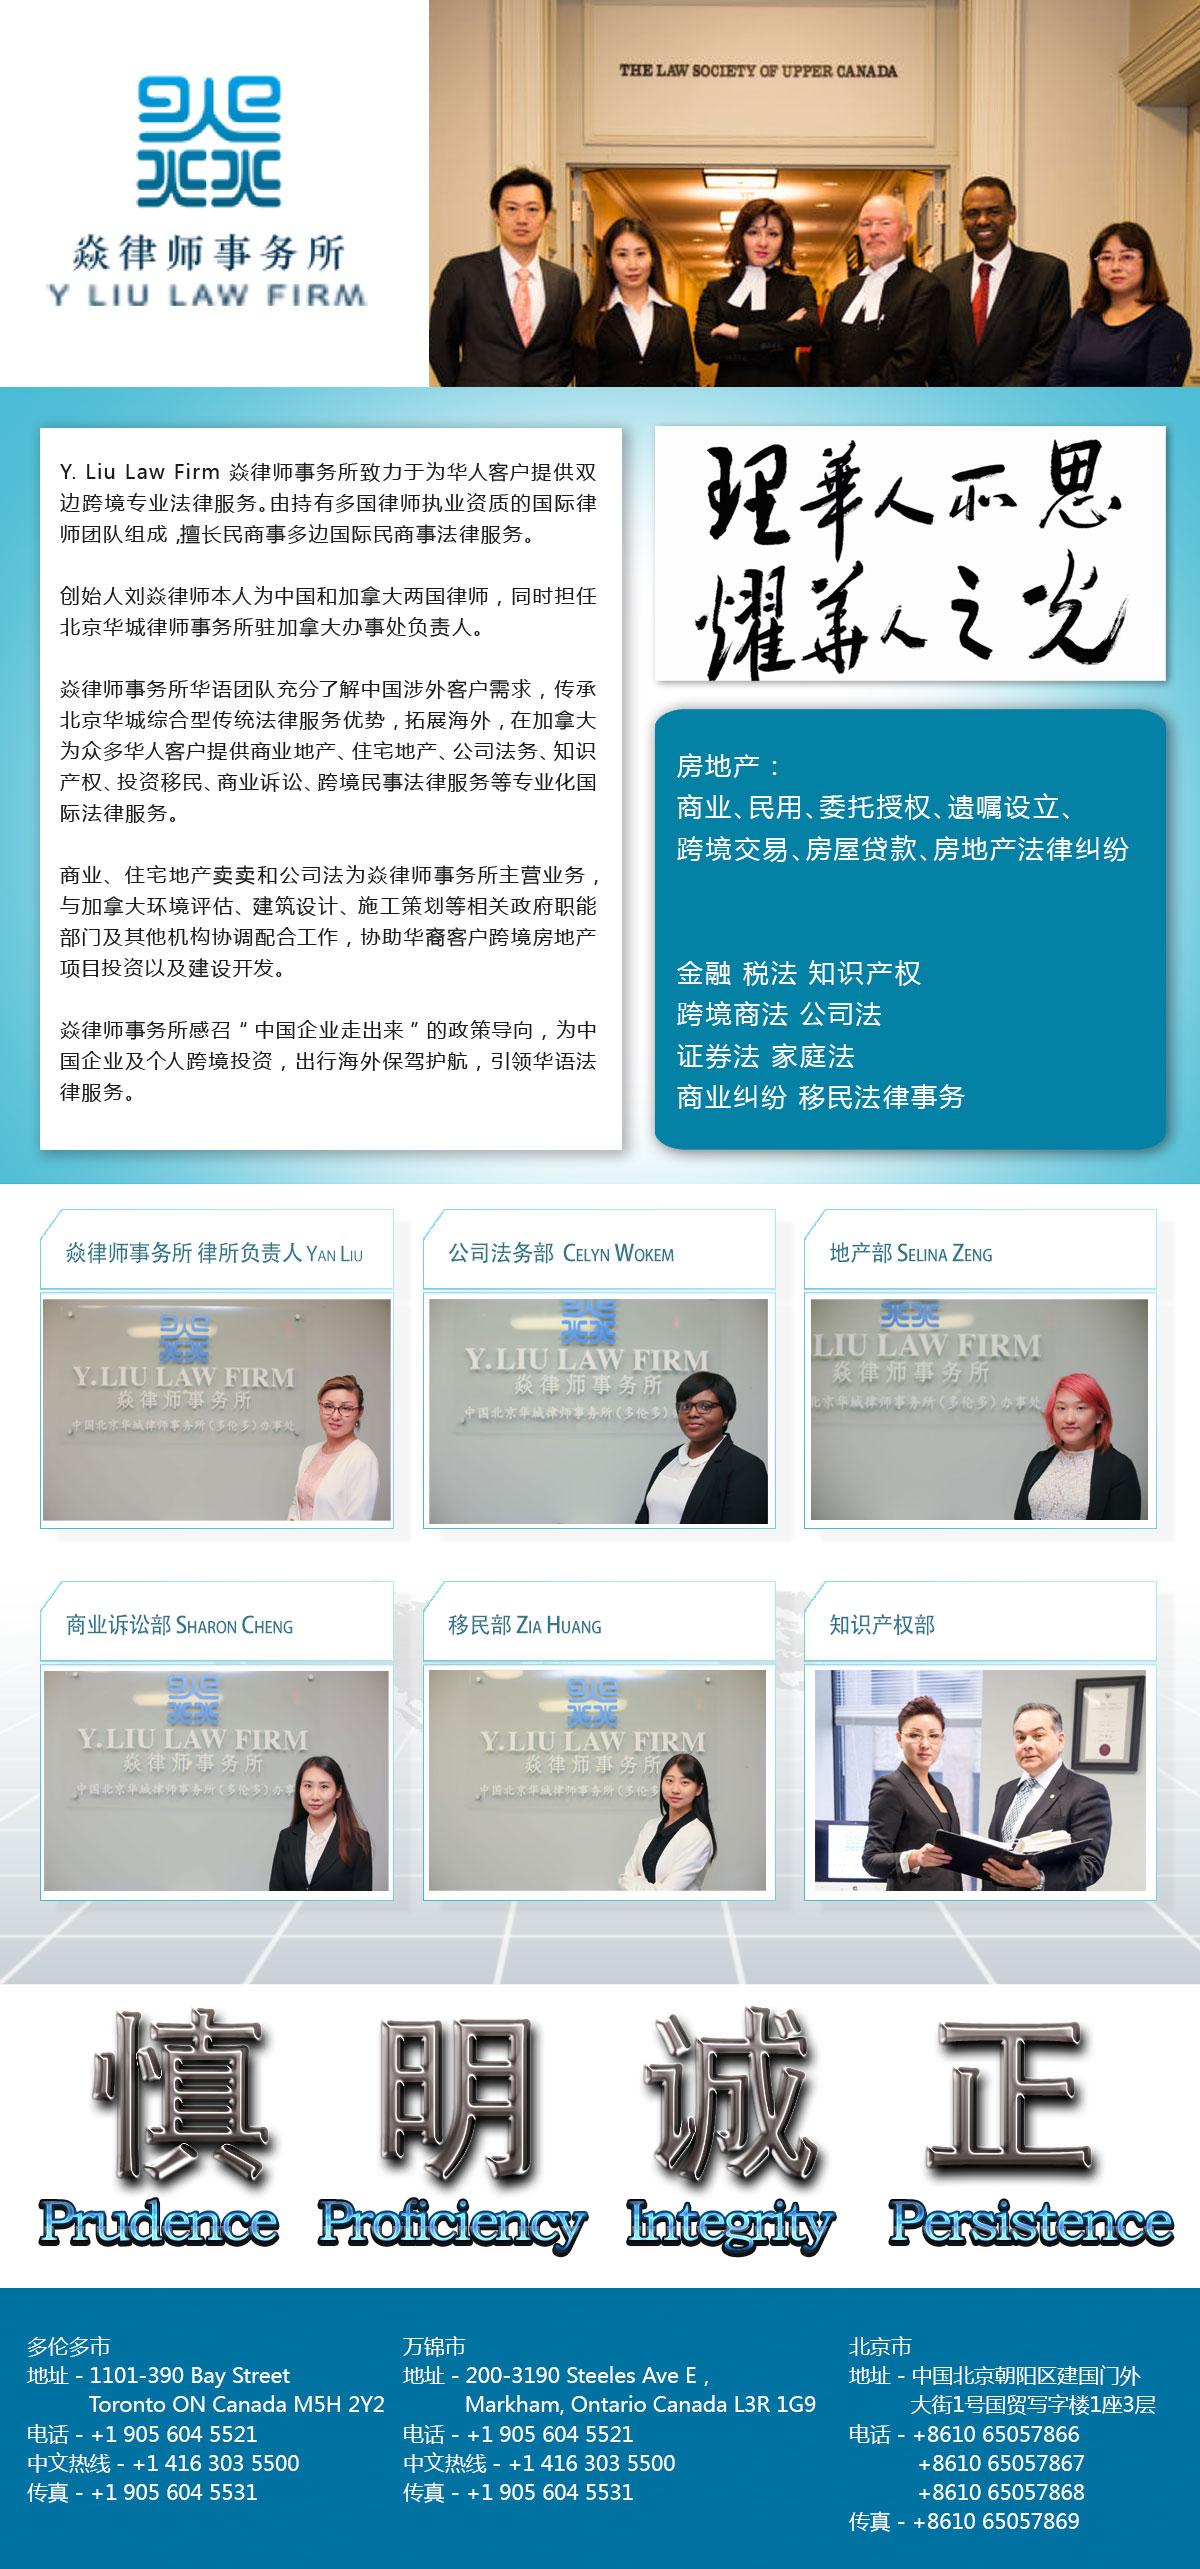 刘焱poster-new-1.jpg